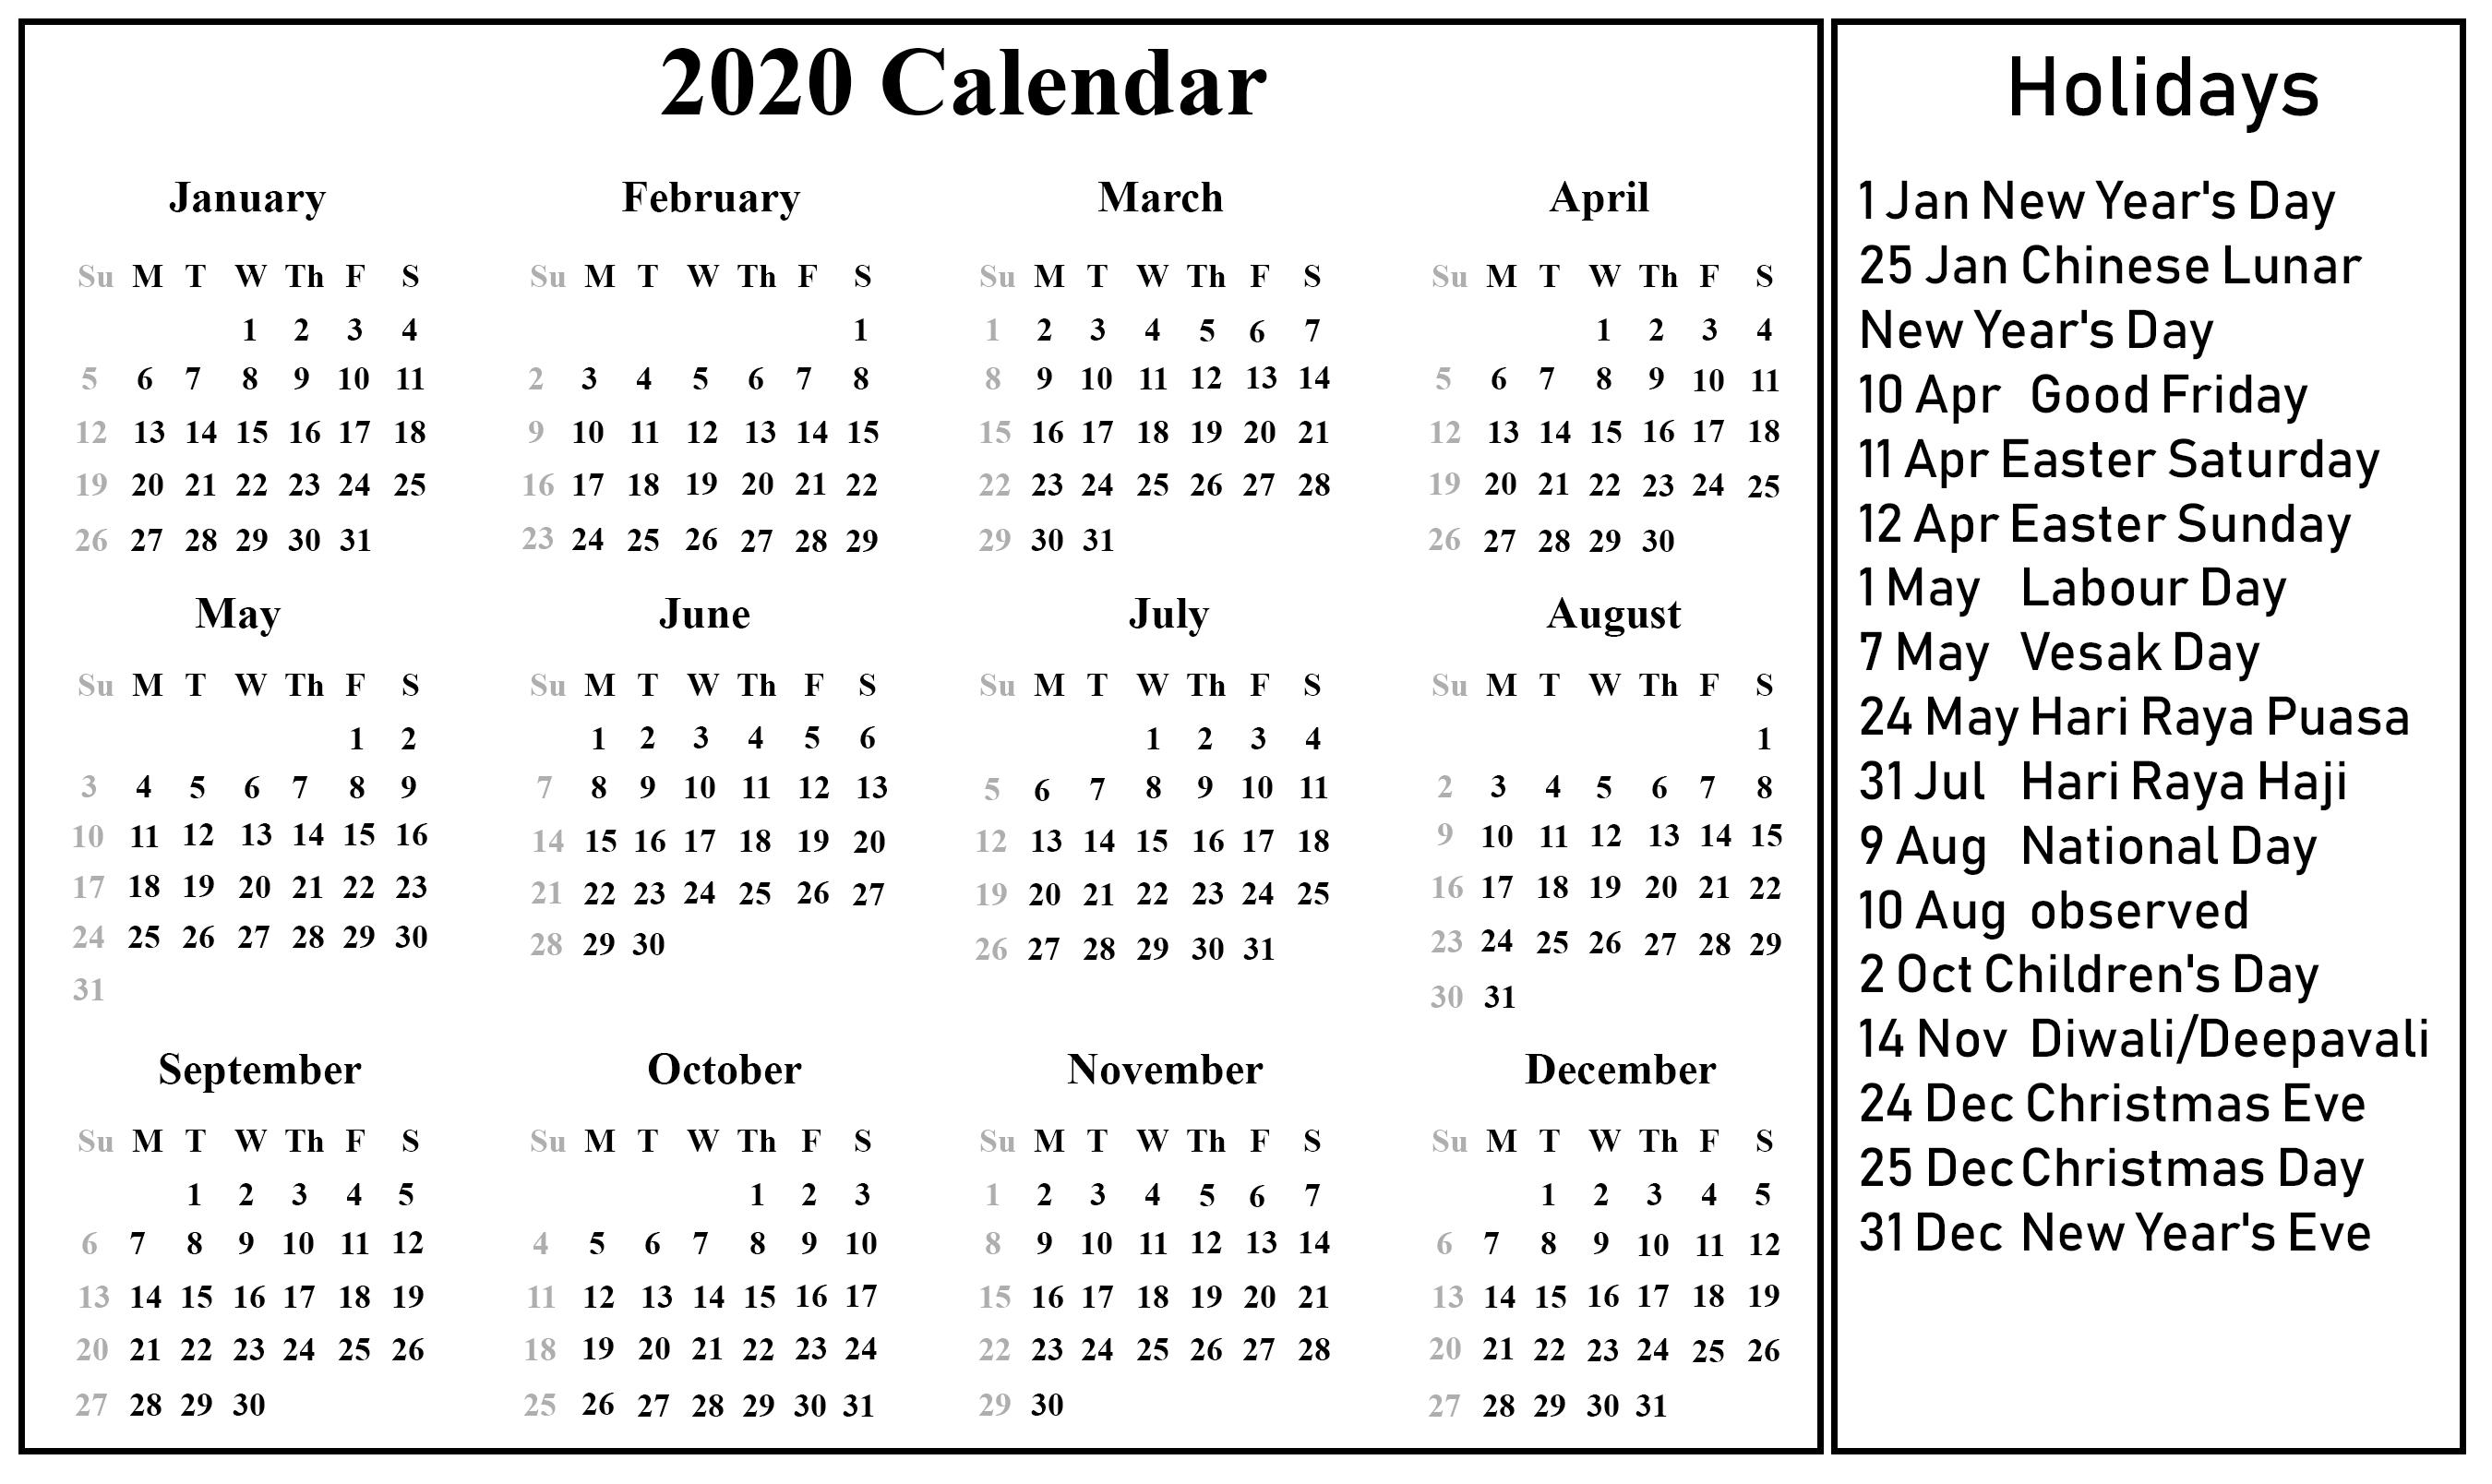 Singapore 2020 Printable Holidays Calendar | 2020 Calendars-January 2020 Calendar Sri Lanka